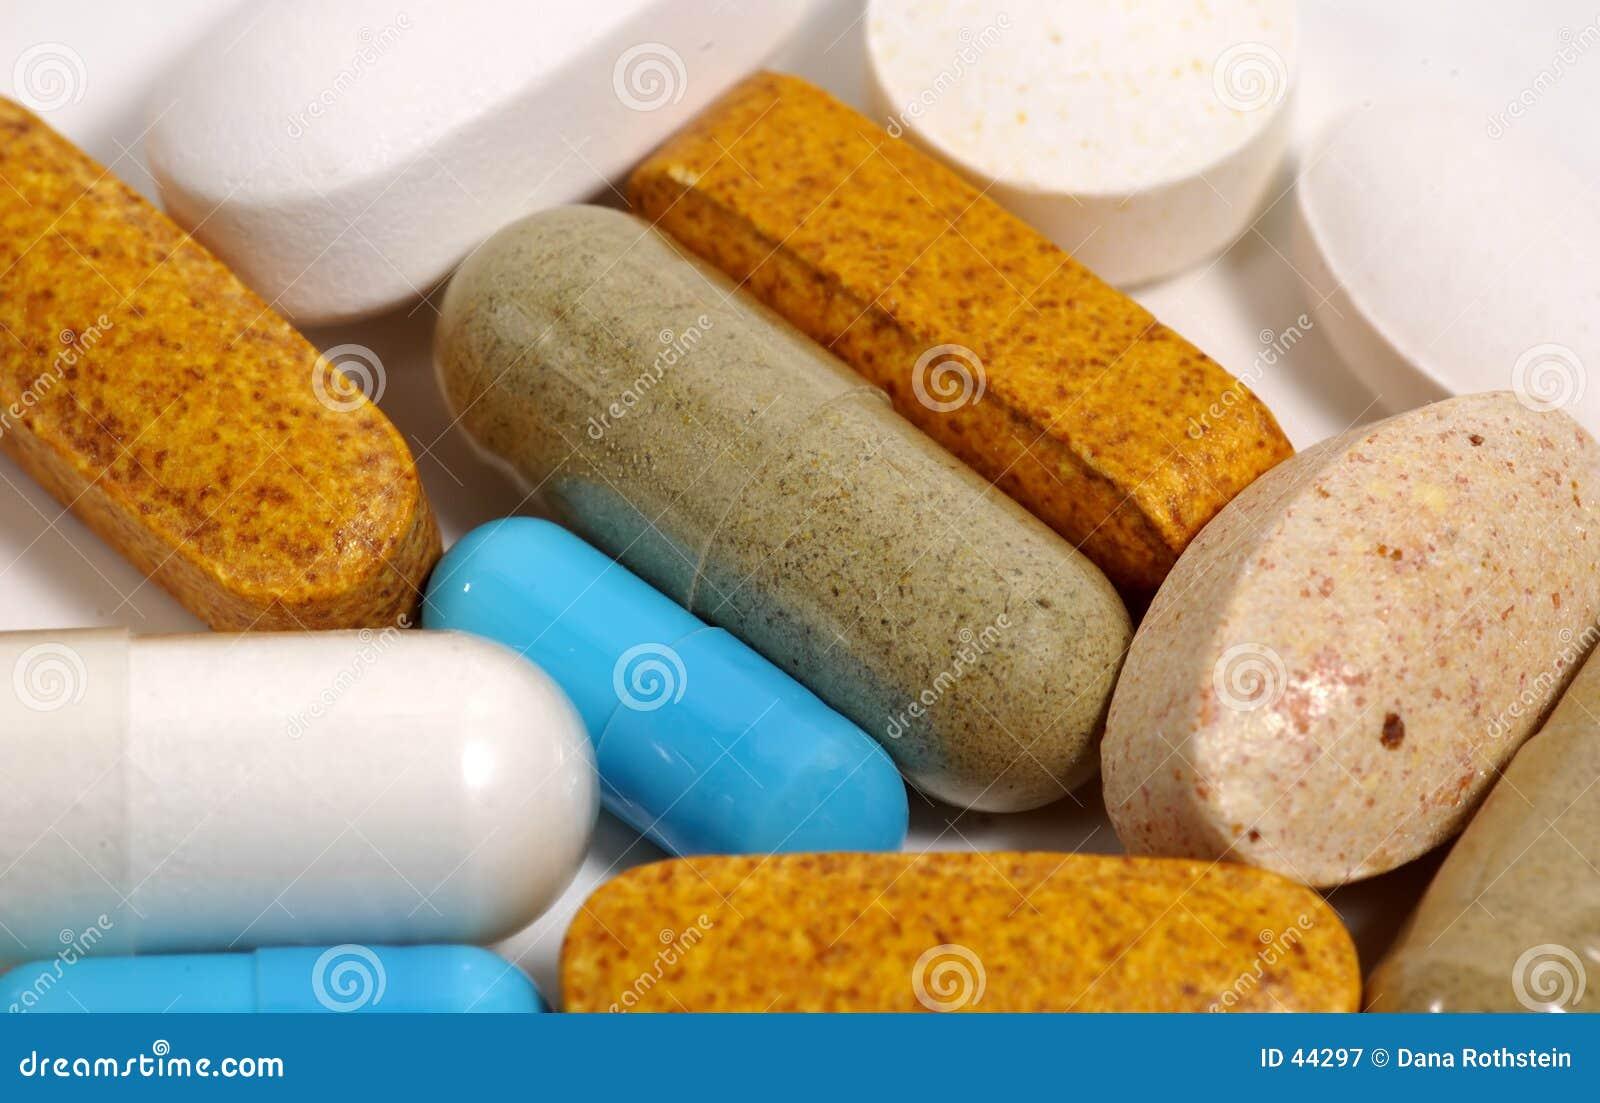 Download Varias píldoras imagen de archivo. Imagen de aspirin, vitaminas - 44297